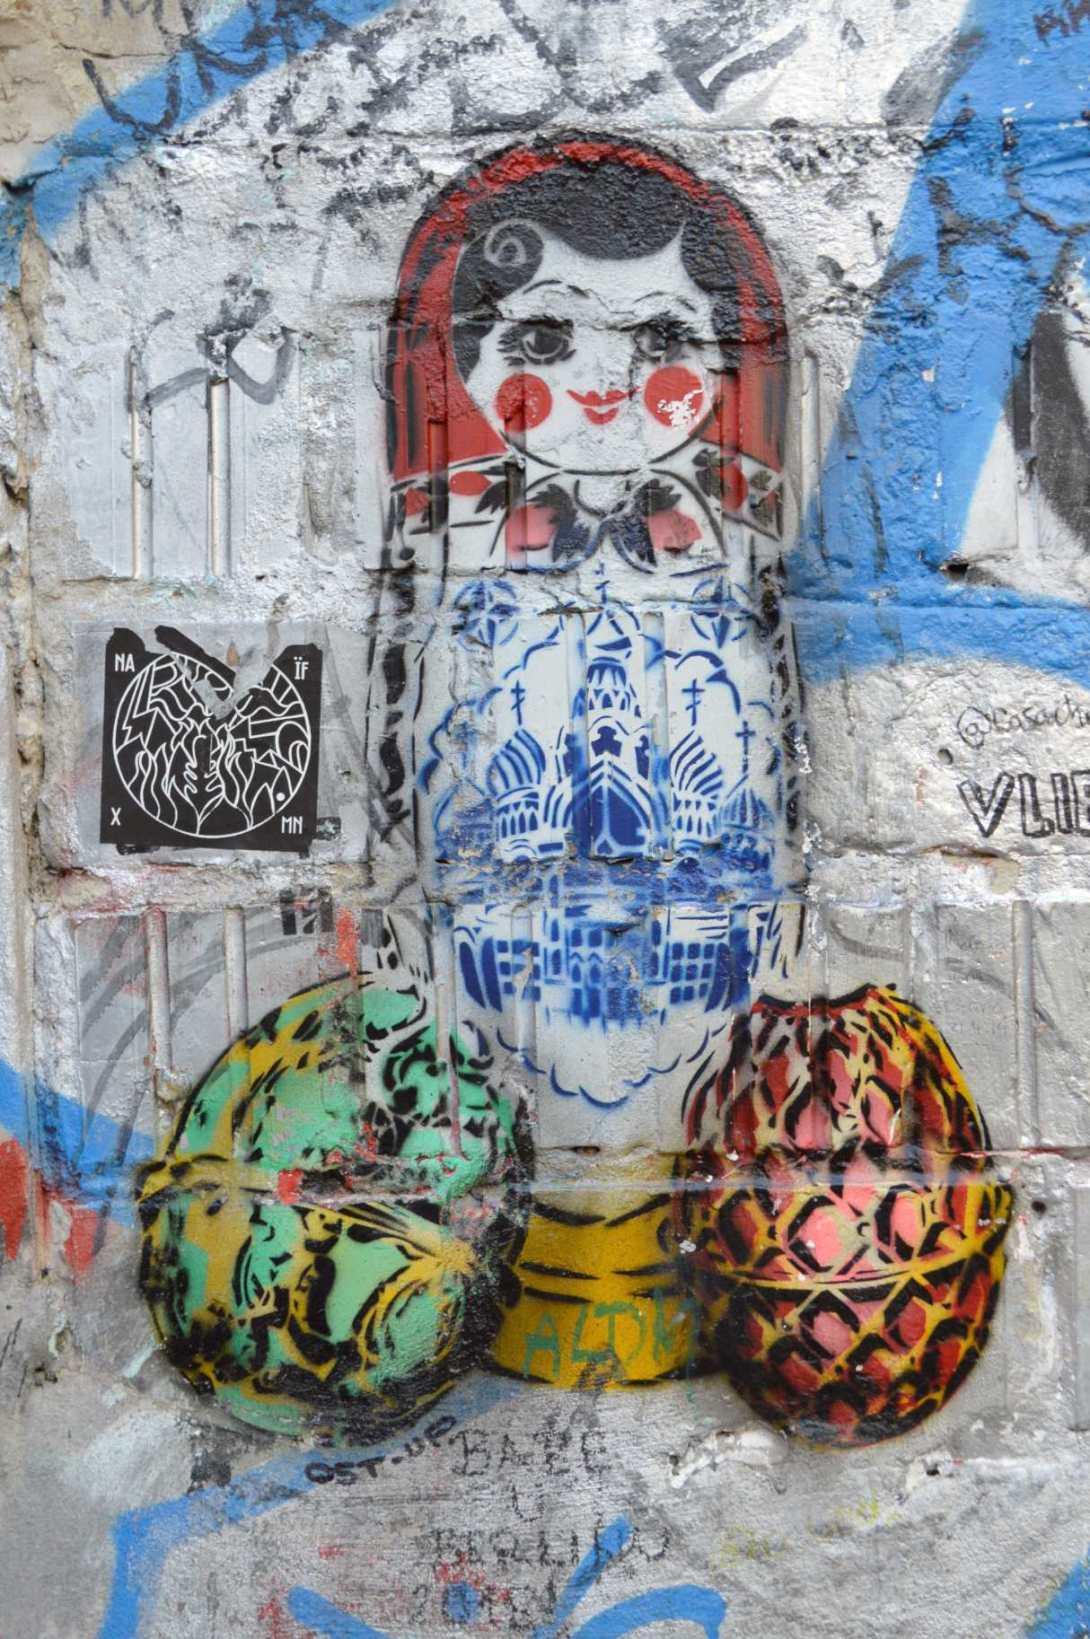 Ost-ap street art berlin nesting doll